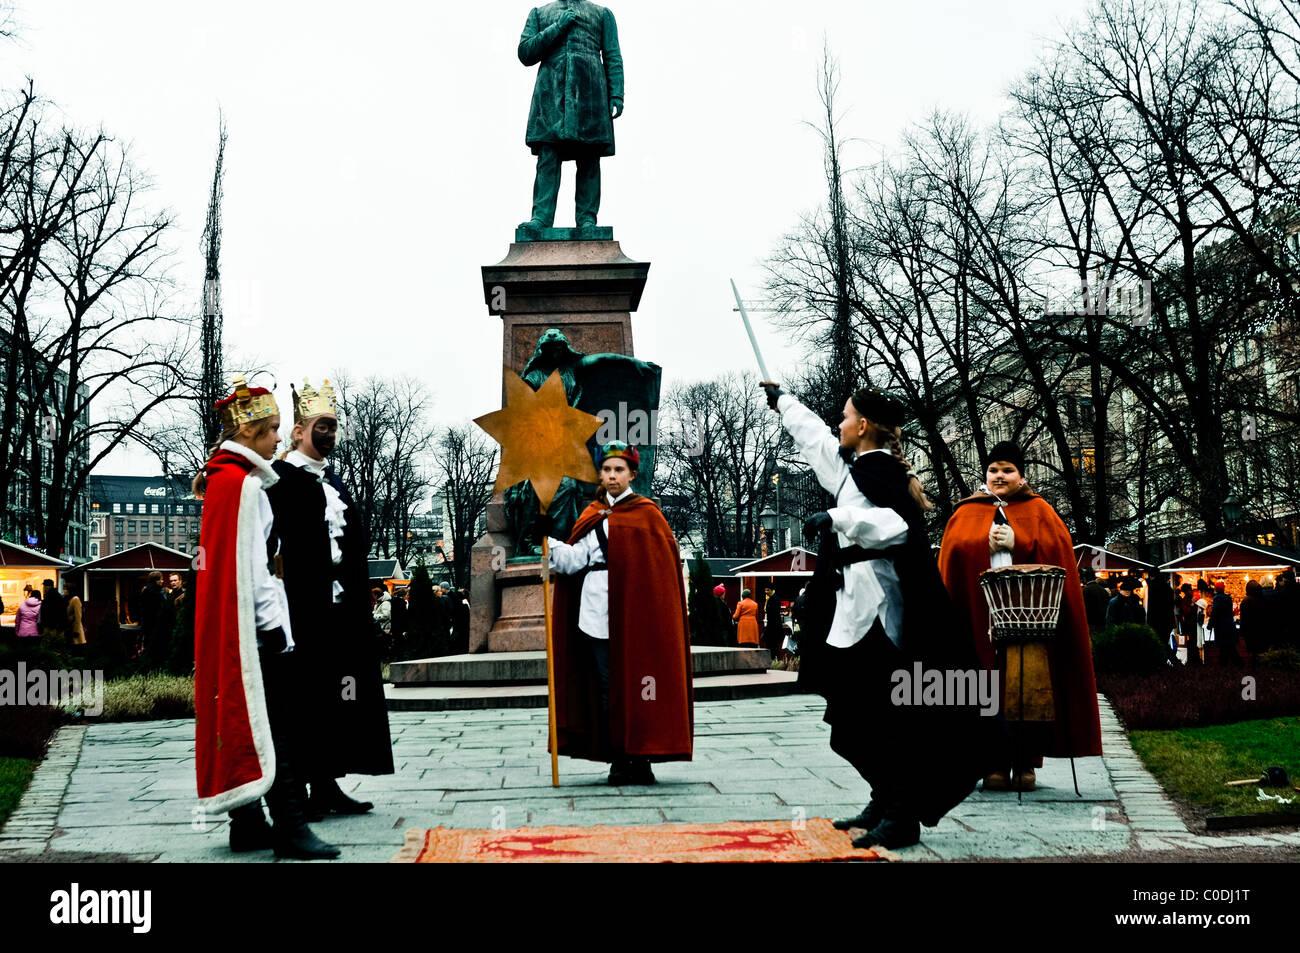 daily life Helsinki, Christmas street theater performance Stock Photo